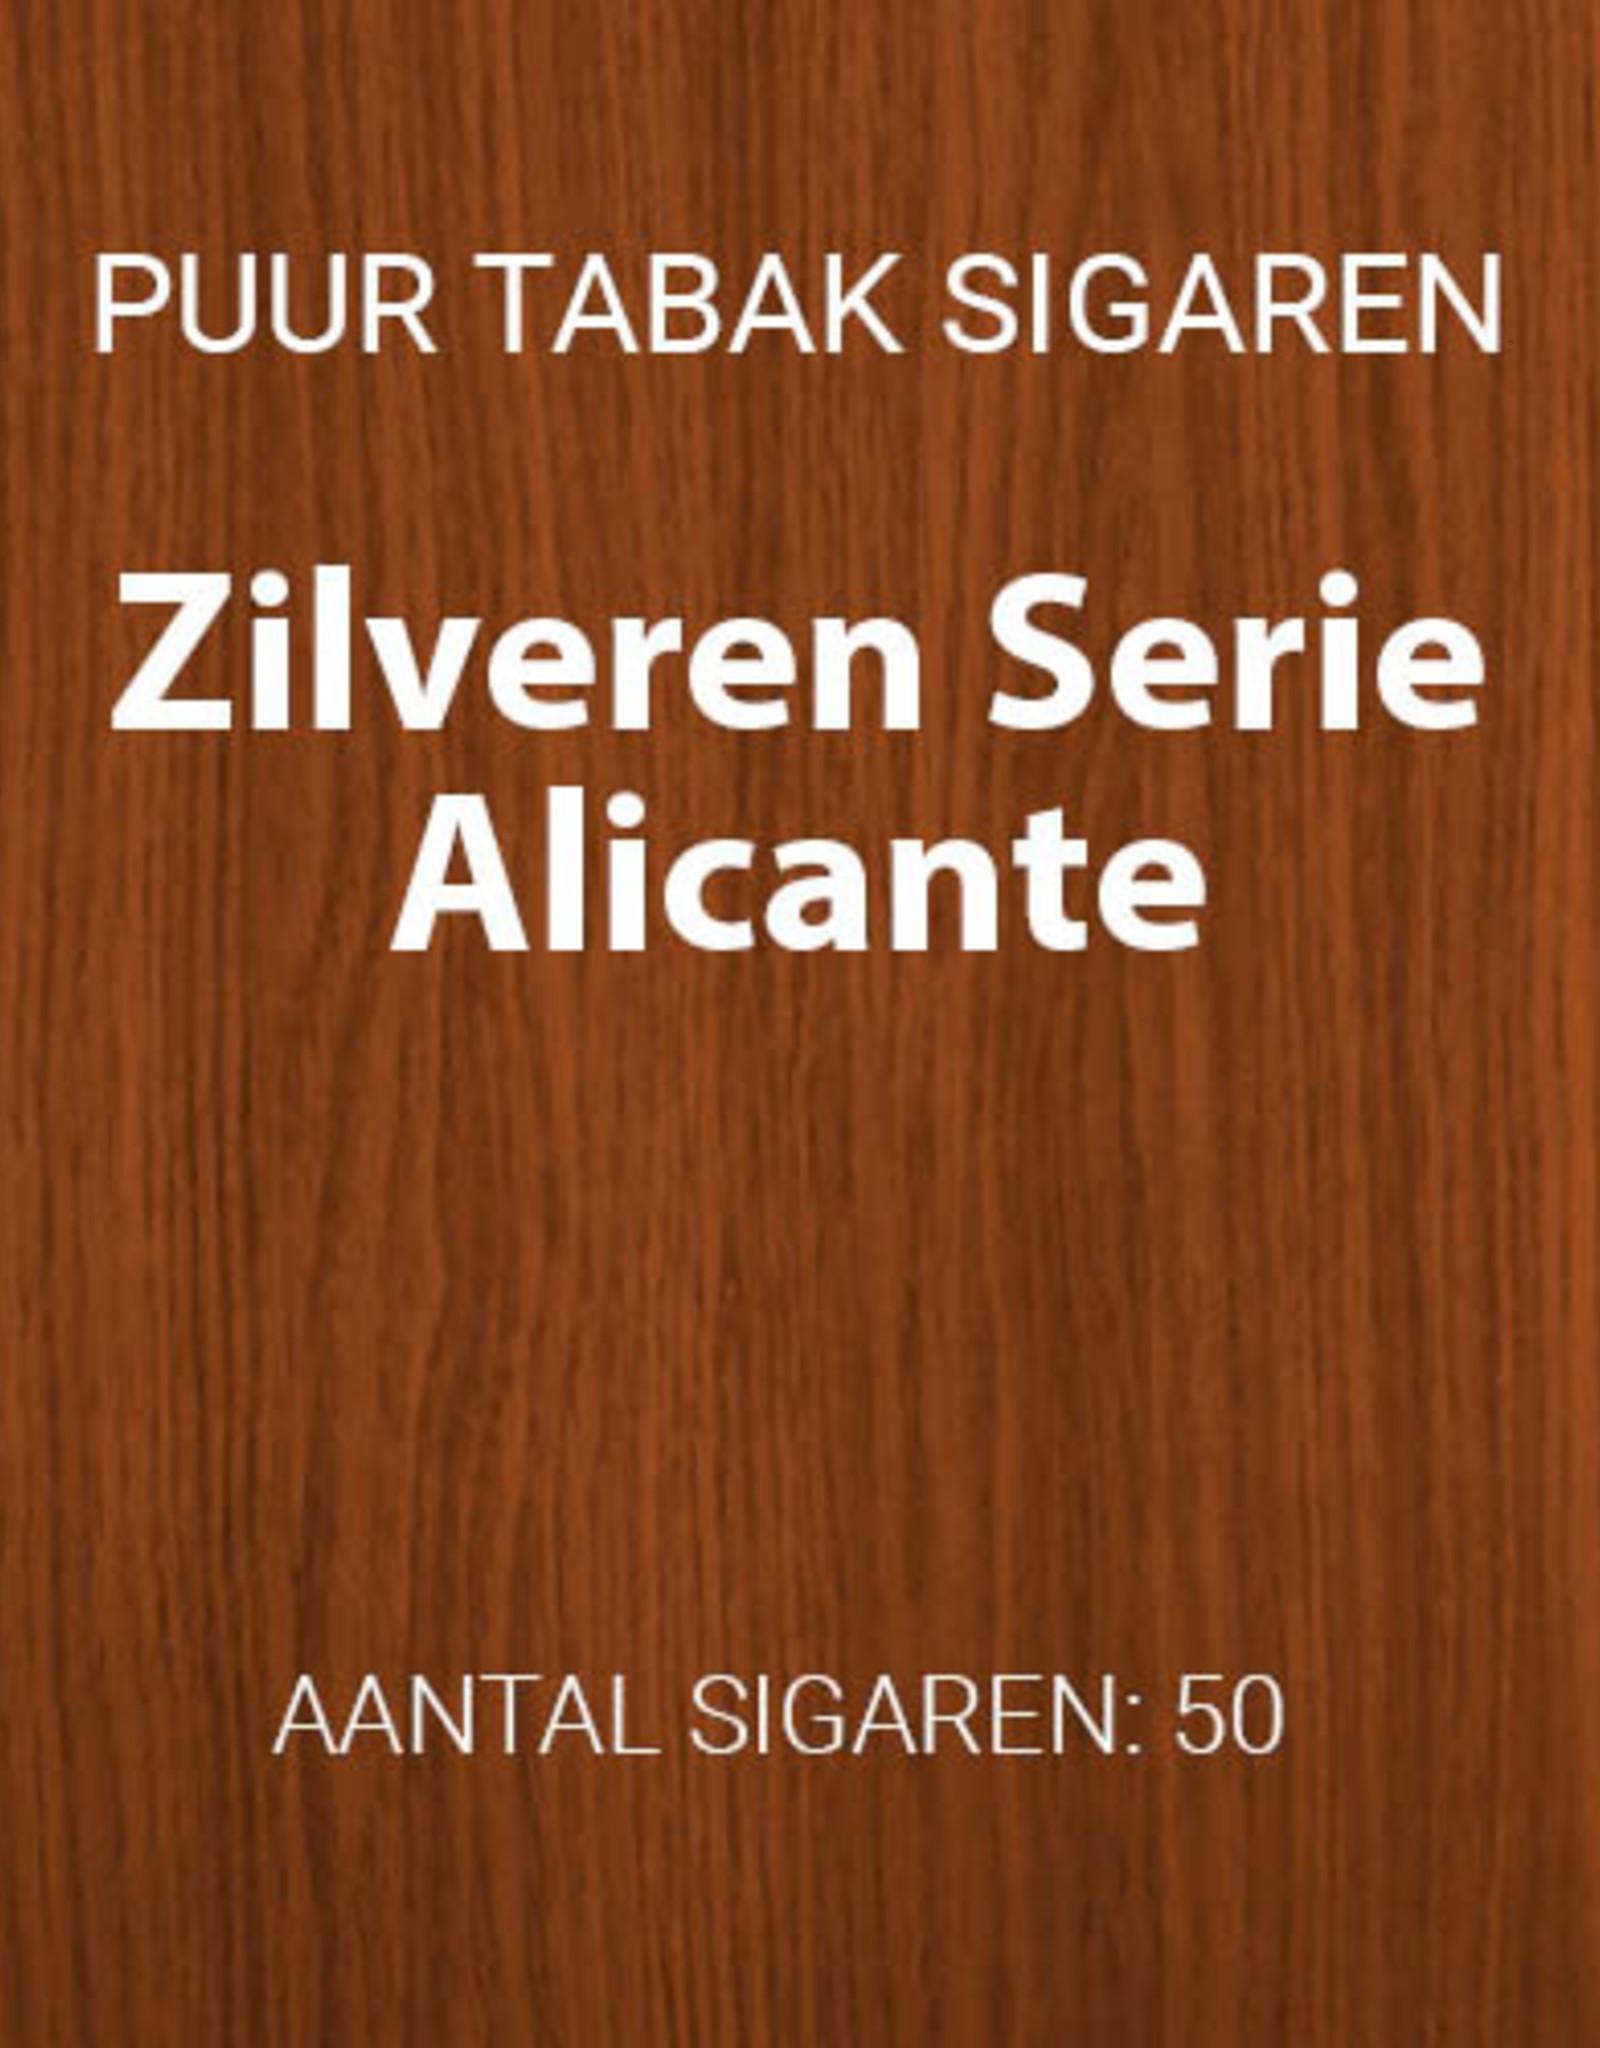 Zilveren serie Alicante Half Corona